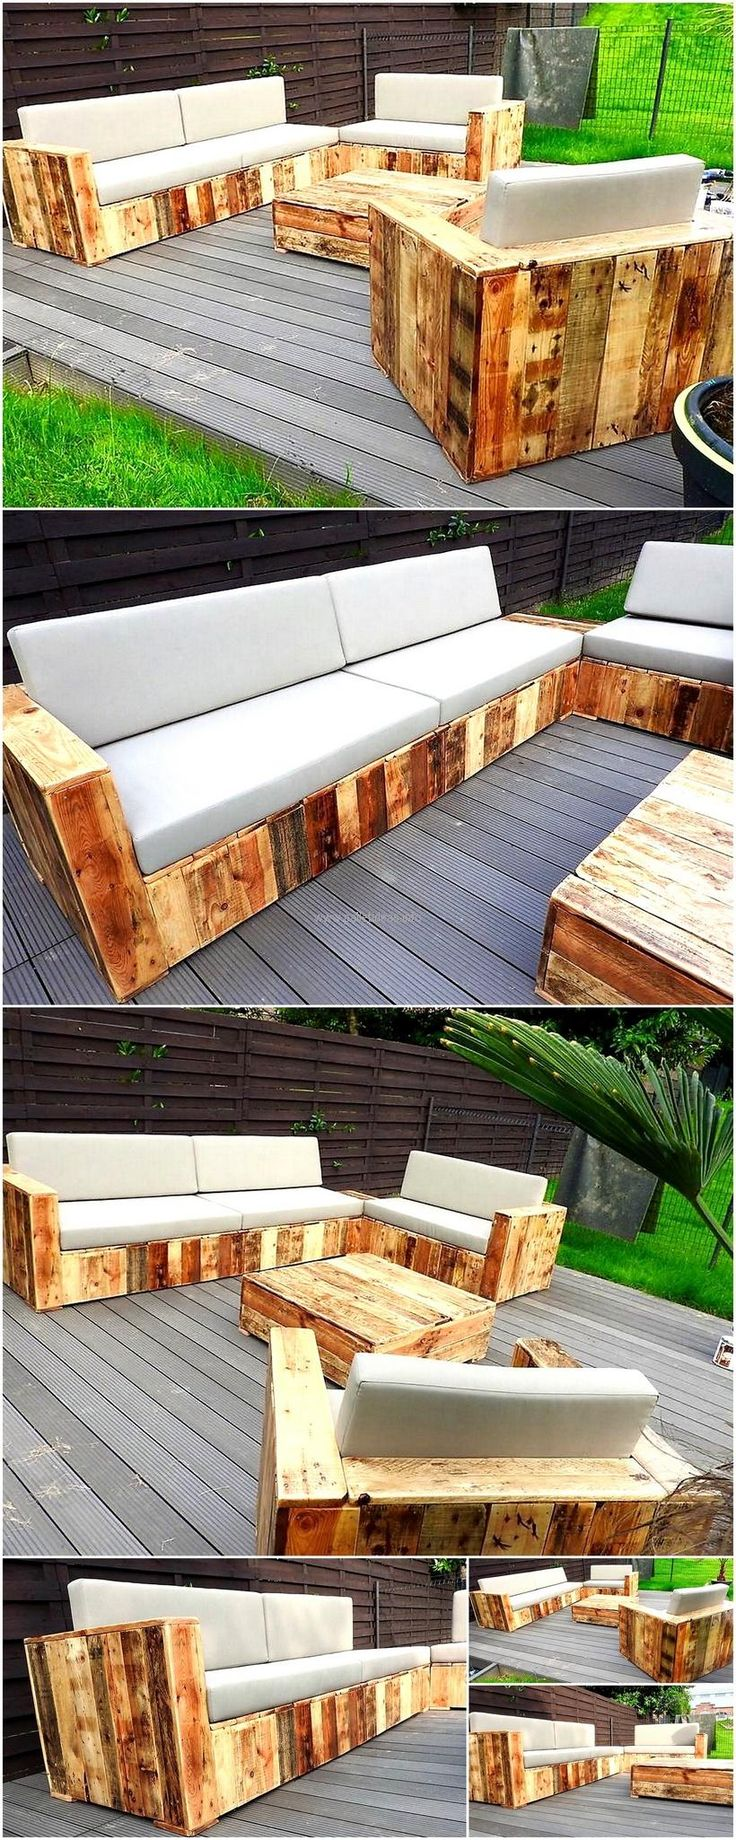 Best 25+ Pallet outdoor furniture ideas on Pinterest | Diy ...